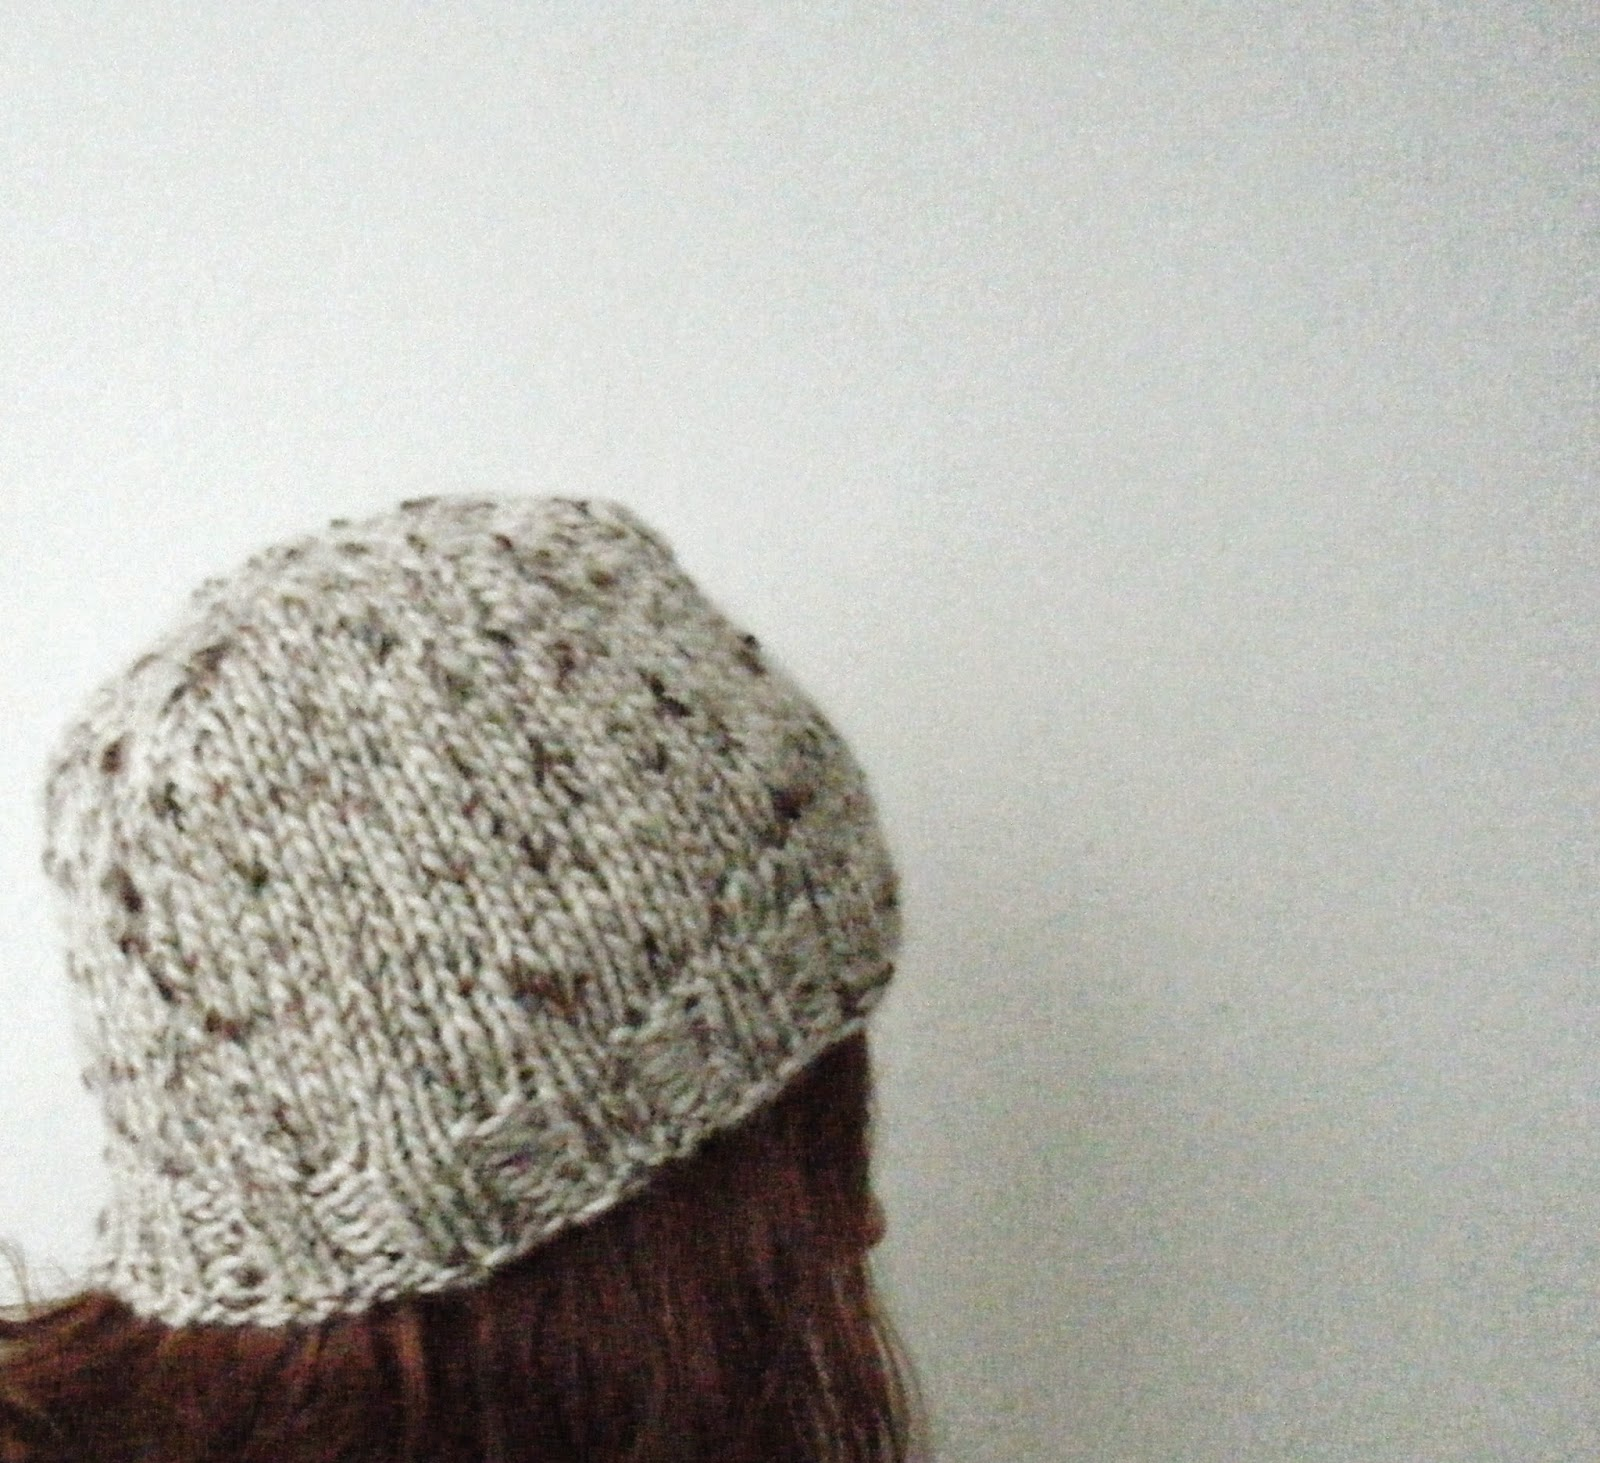 tricoter jersey aiguilles circulaires